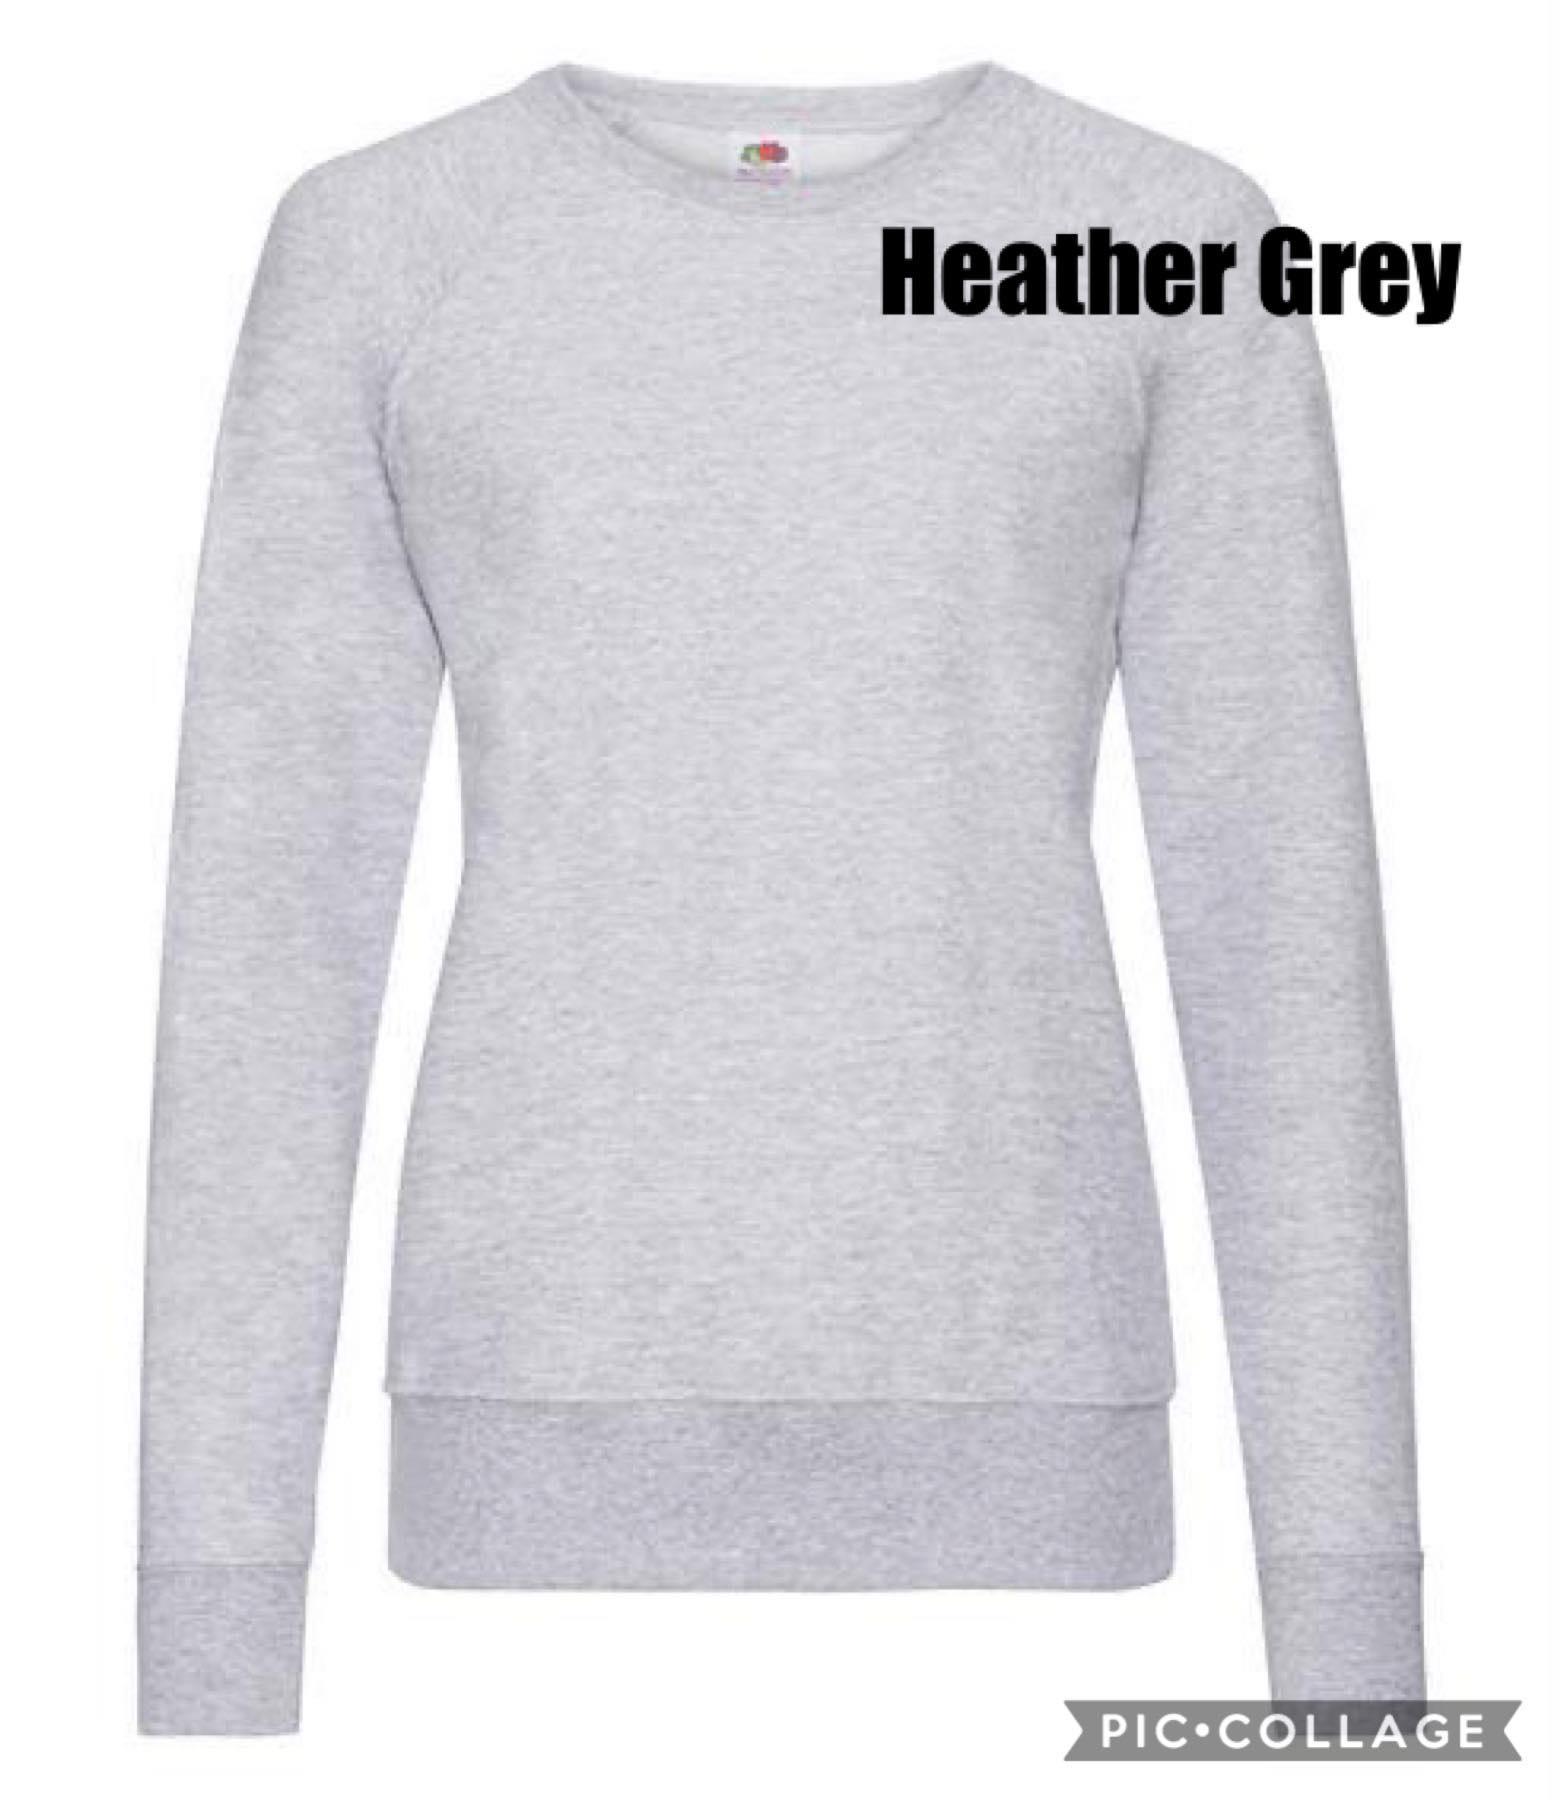 Be the light sweatshirt